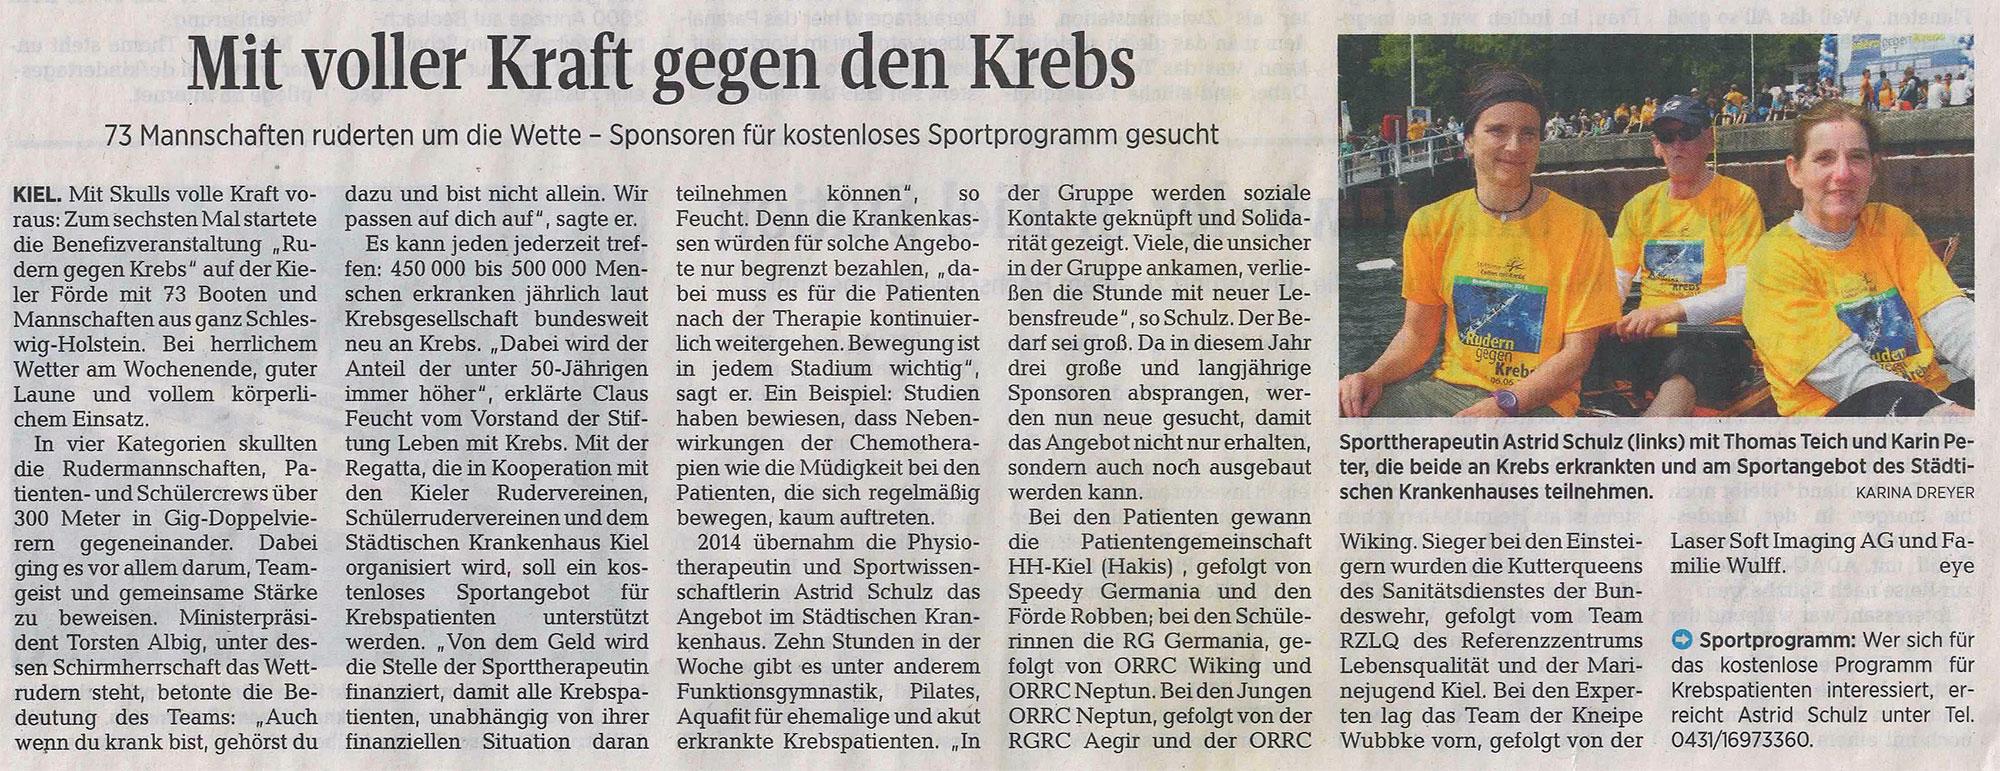 Kieler Nachrichten, 8. Juni 2015, S. 16